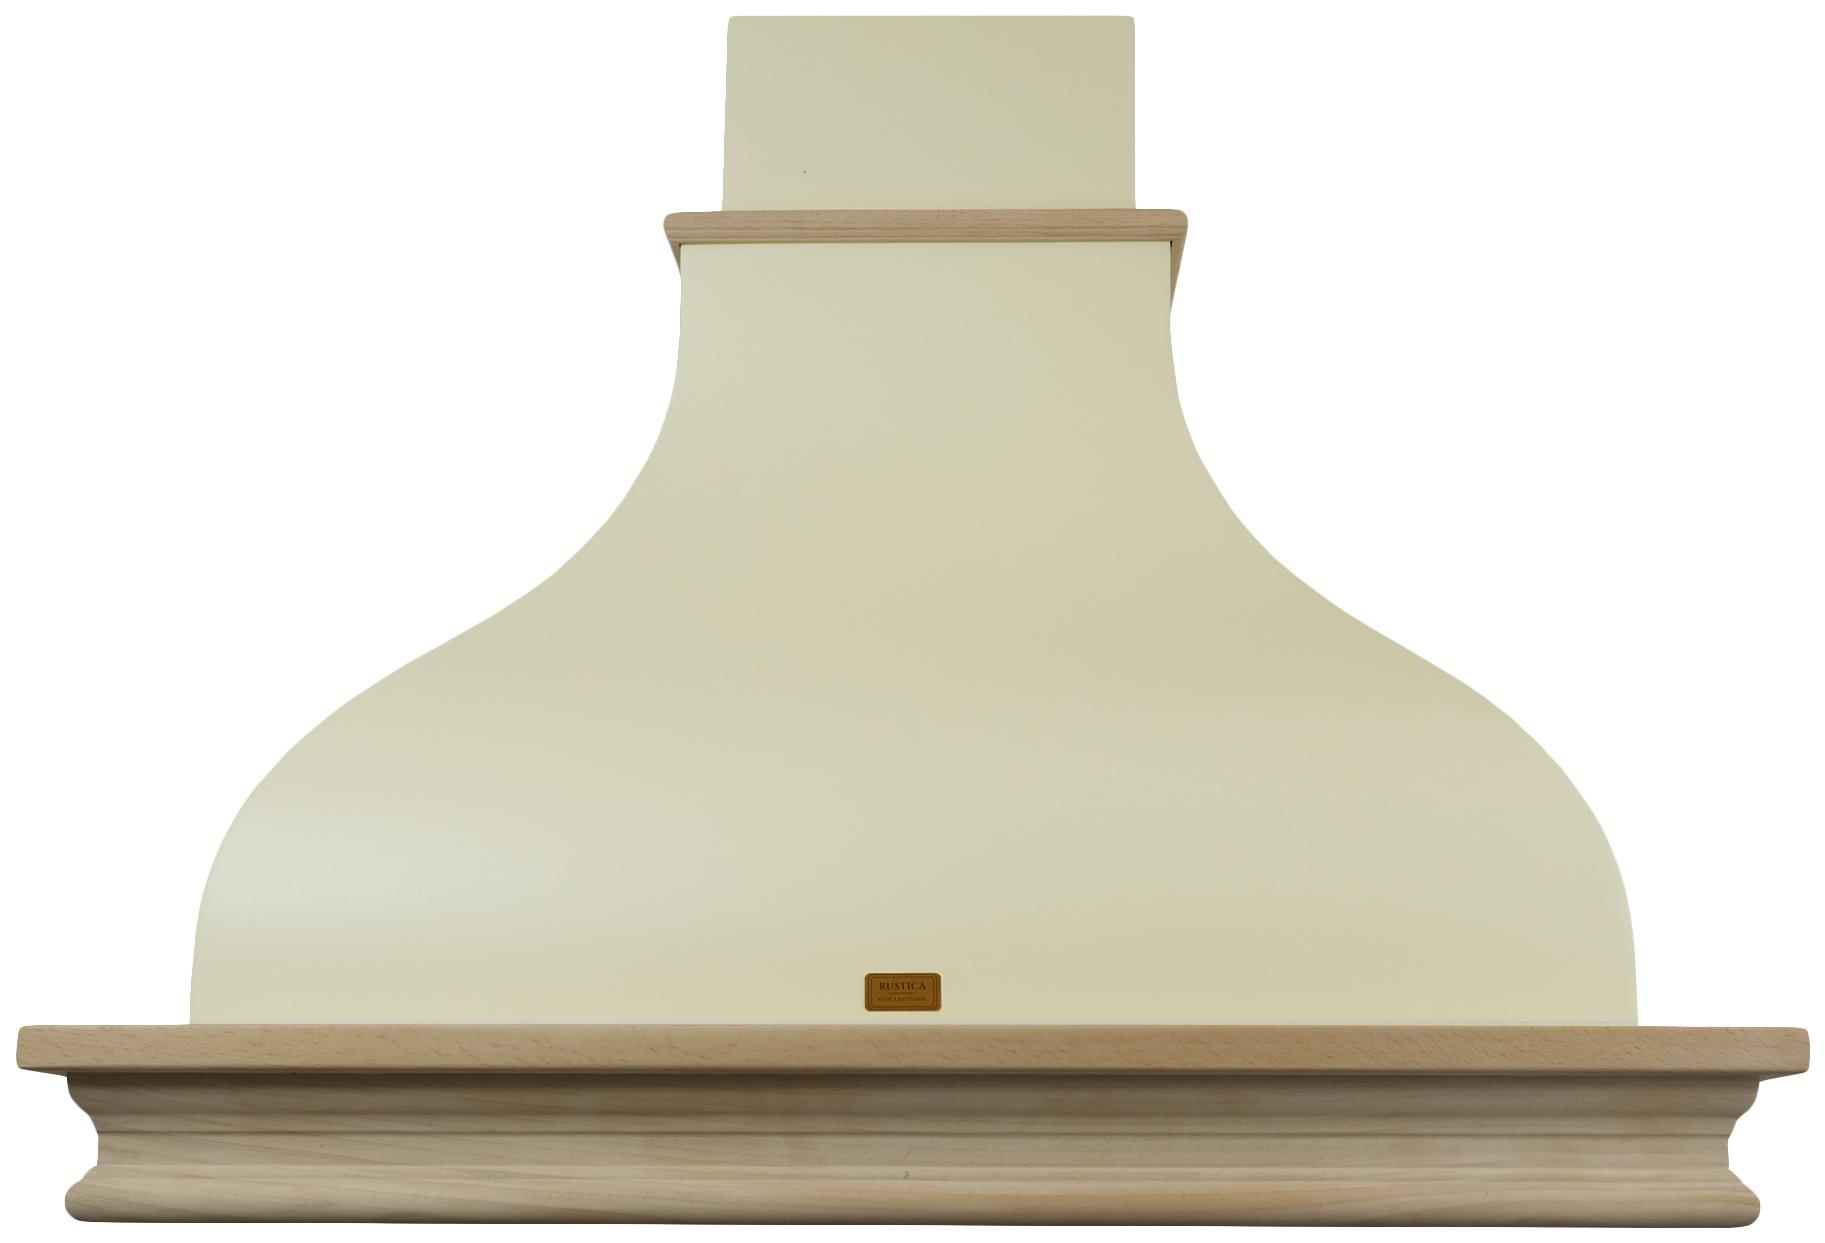 Вытяжка купольная LEX Torino 900 Beige/Brown